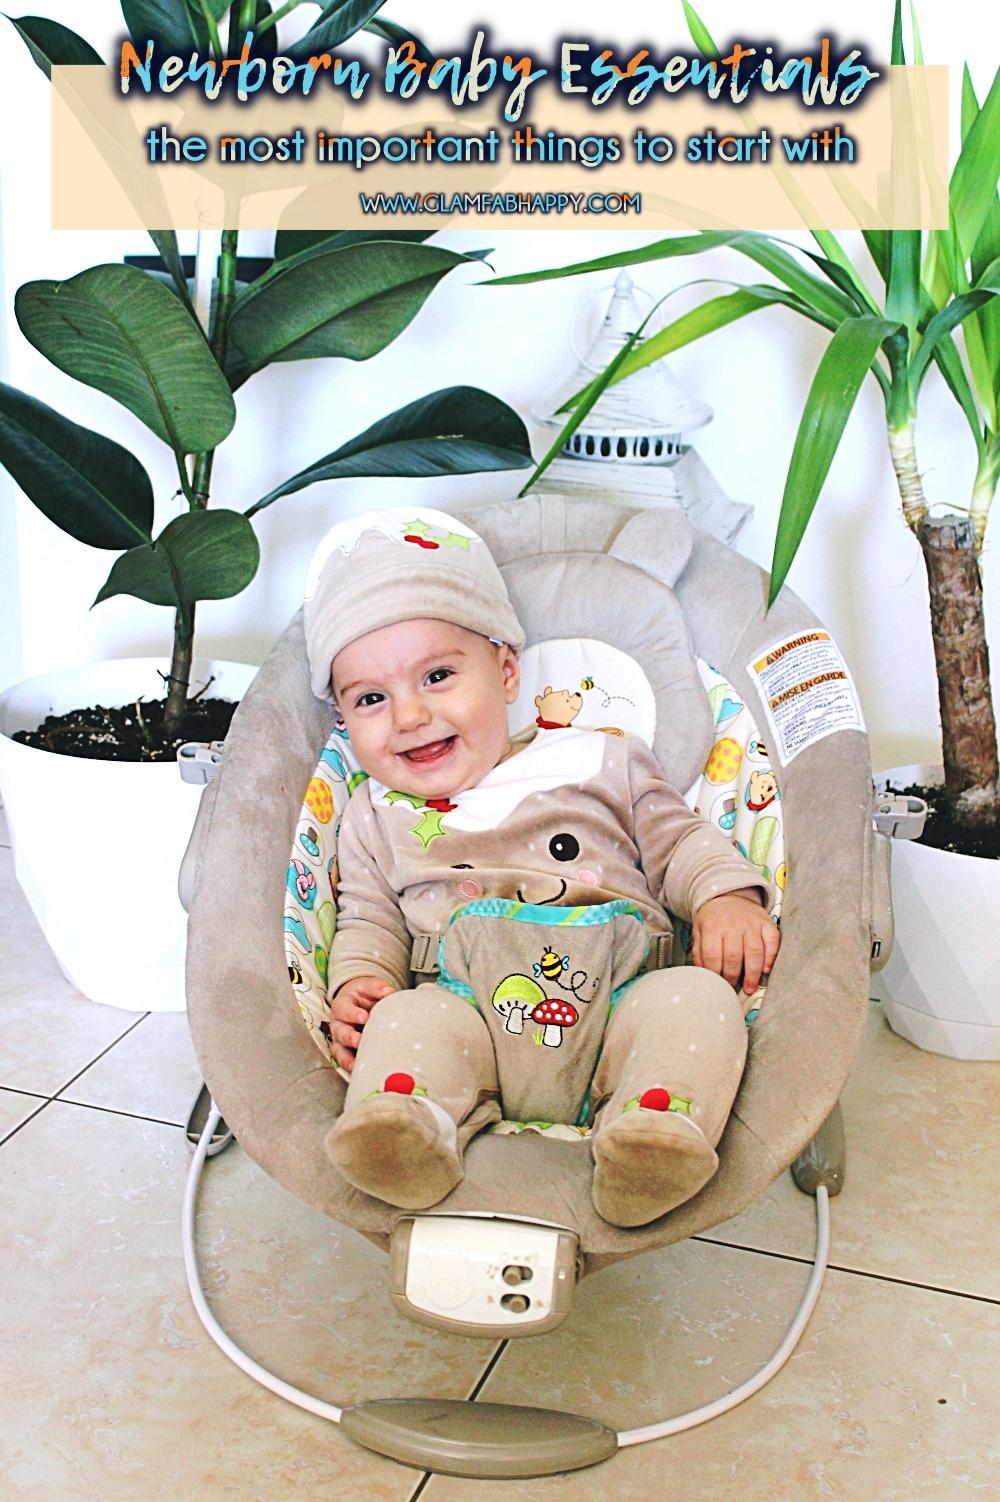 newborn baby essentials checklist and tips, motherhood tips, mom blog, easy motherhood